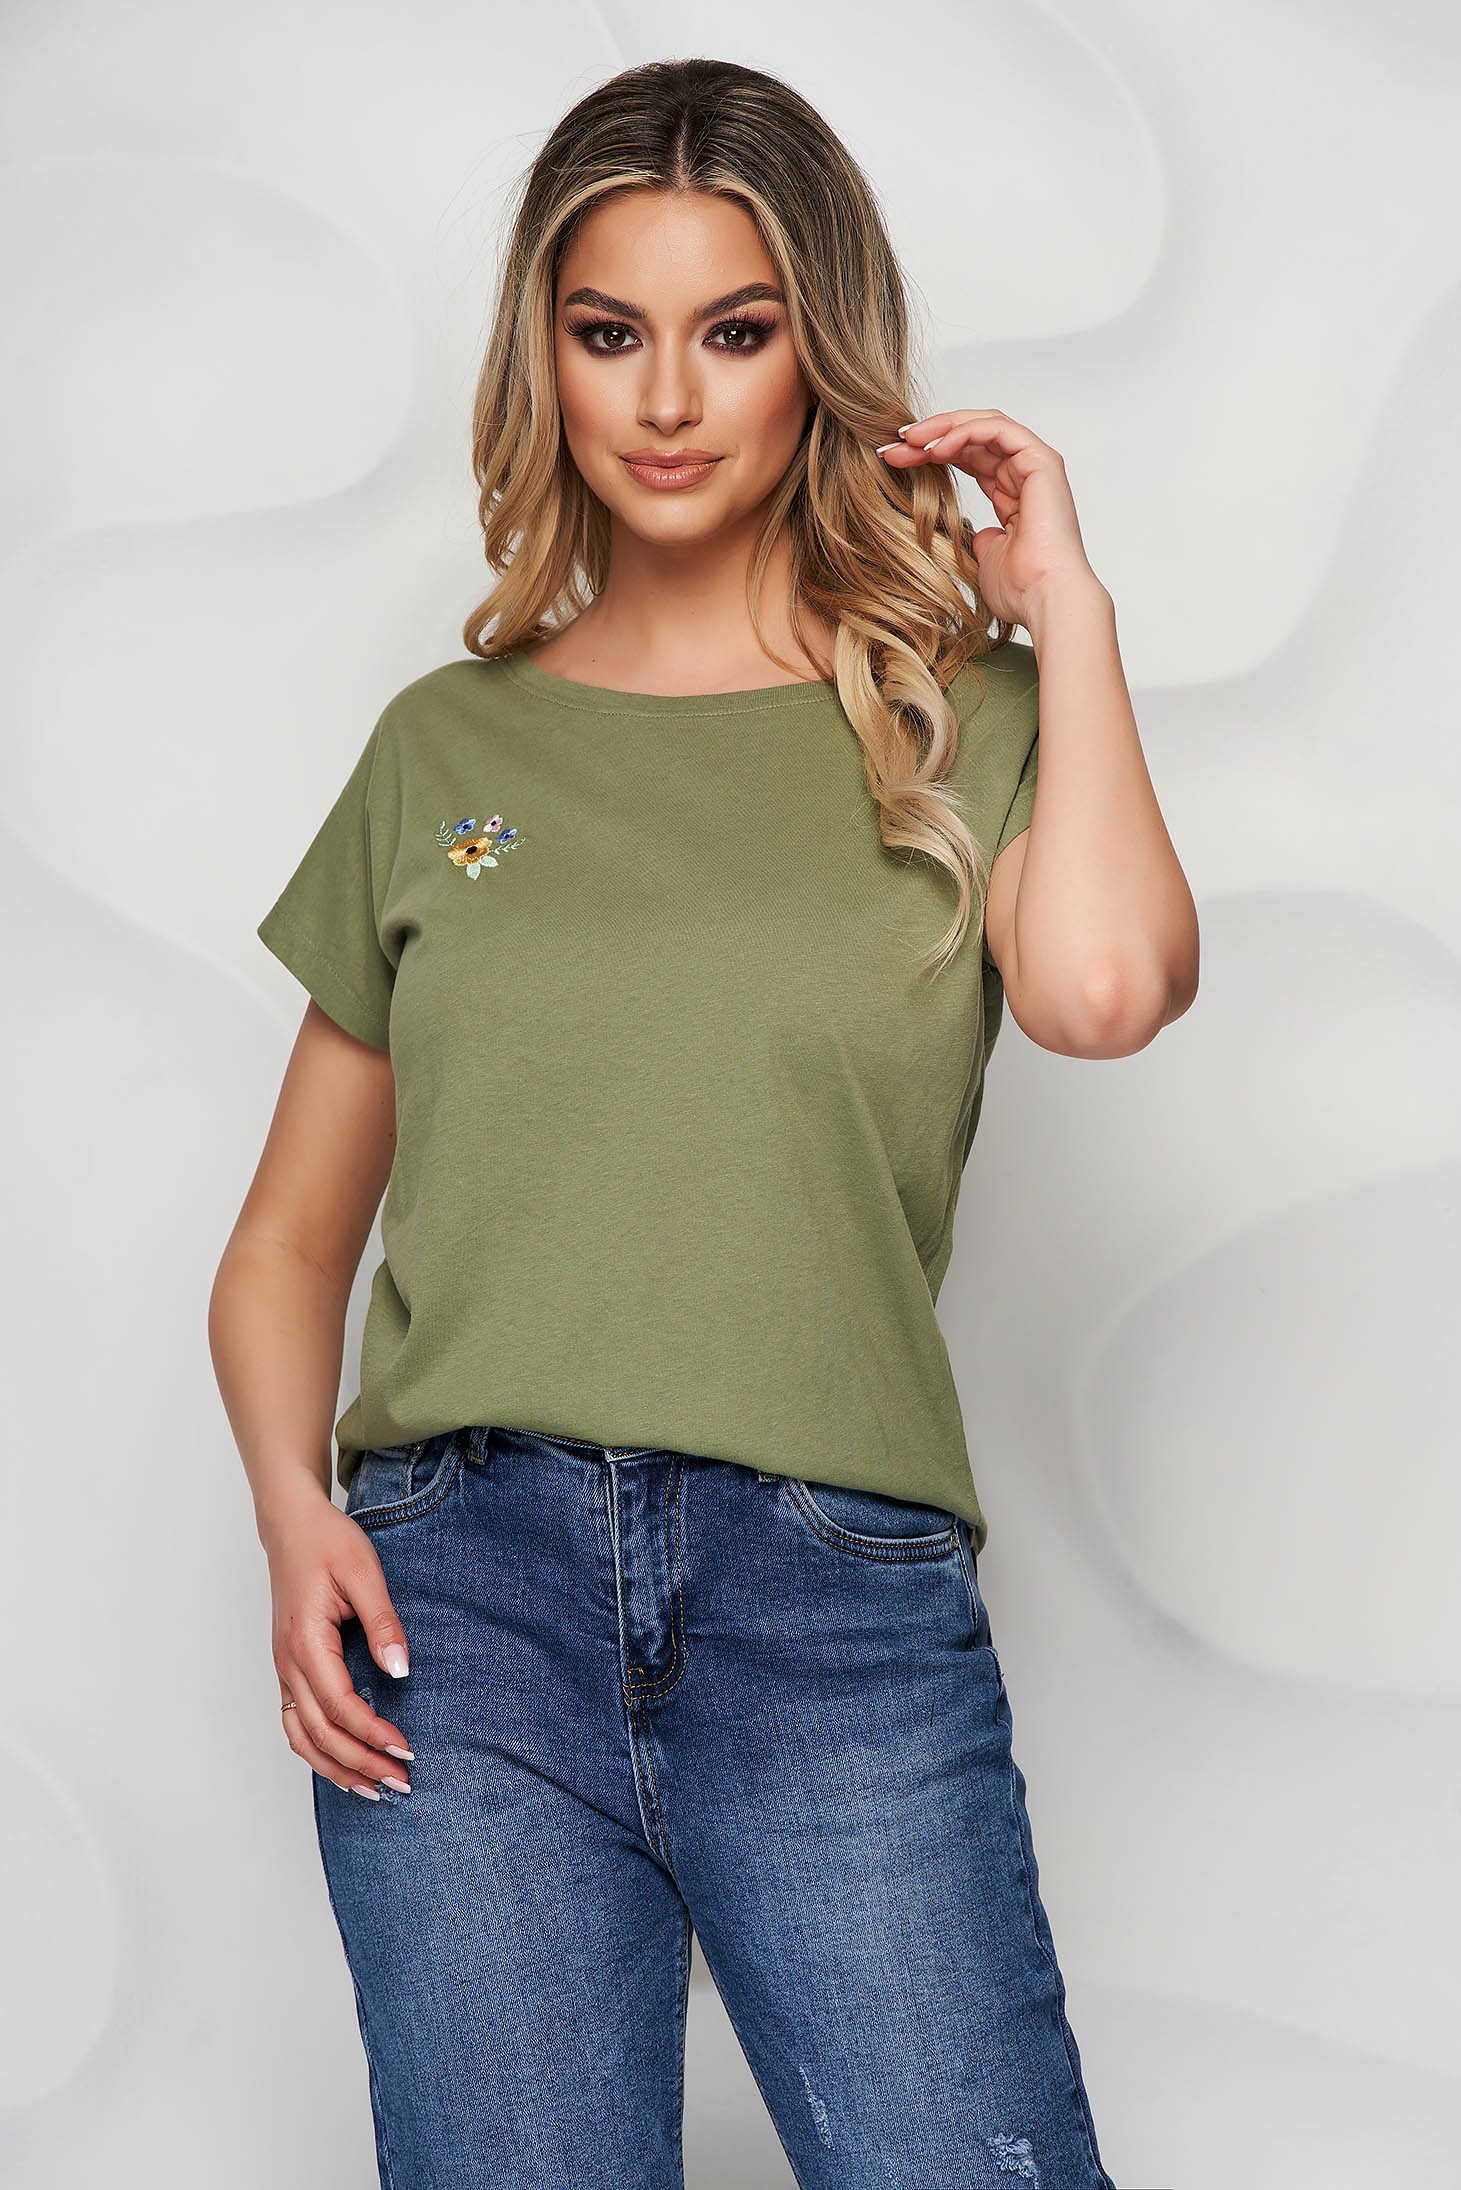 StarShinerS khaki top shirt slightly elastic cotton loose fit